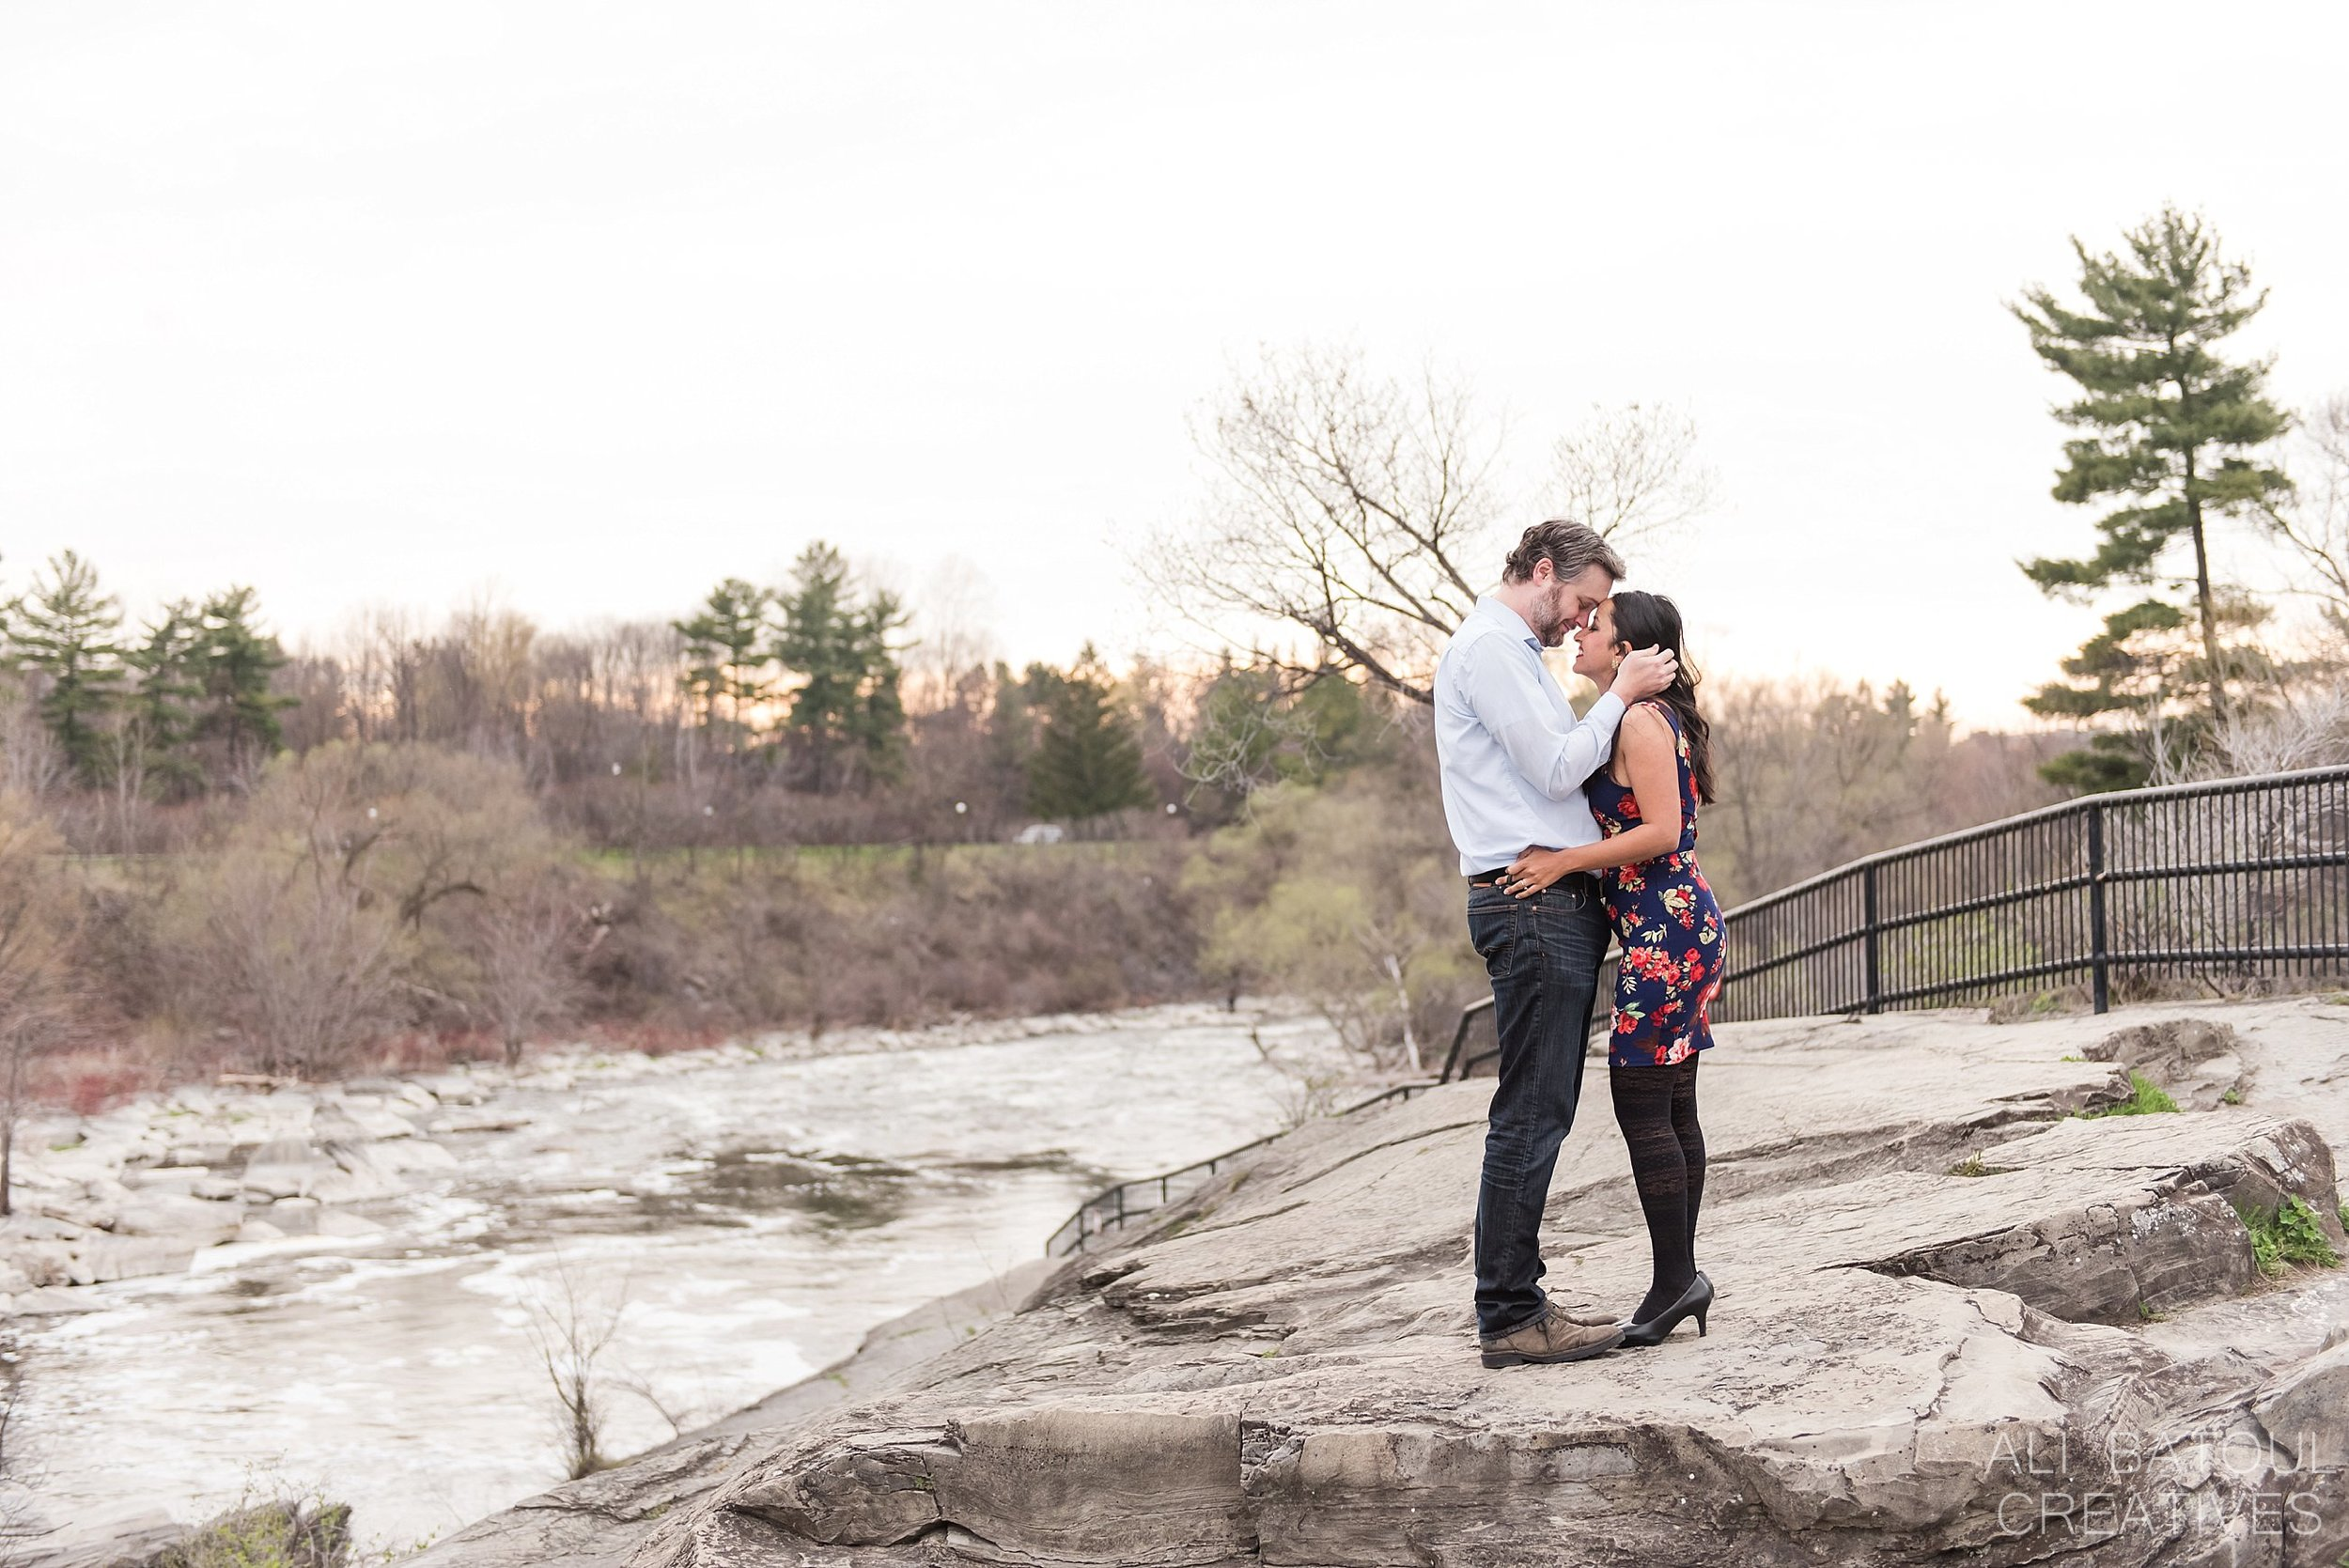 Uzma + Ian Engagement - Ali Batoul Creatives Fine Art Wedding Photography_0219.jpg